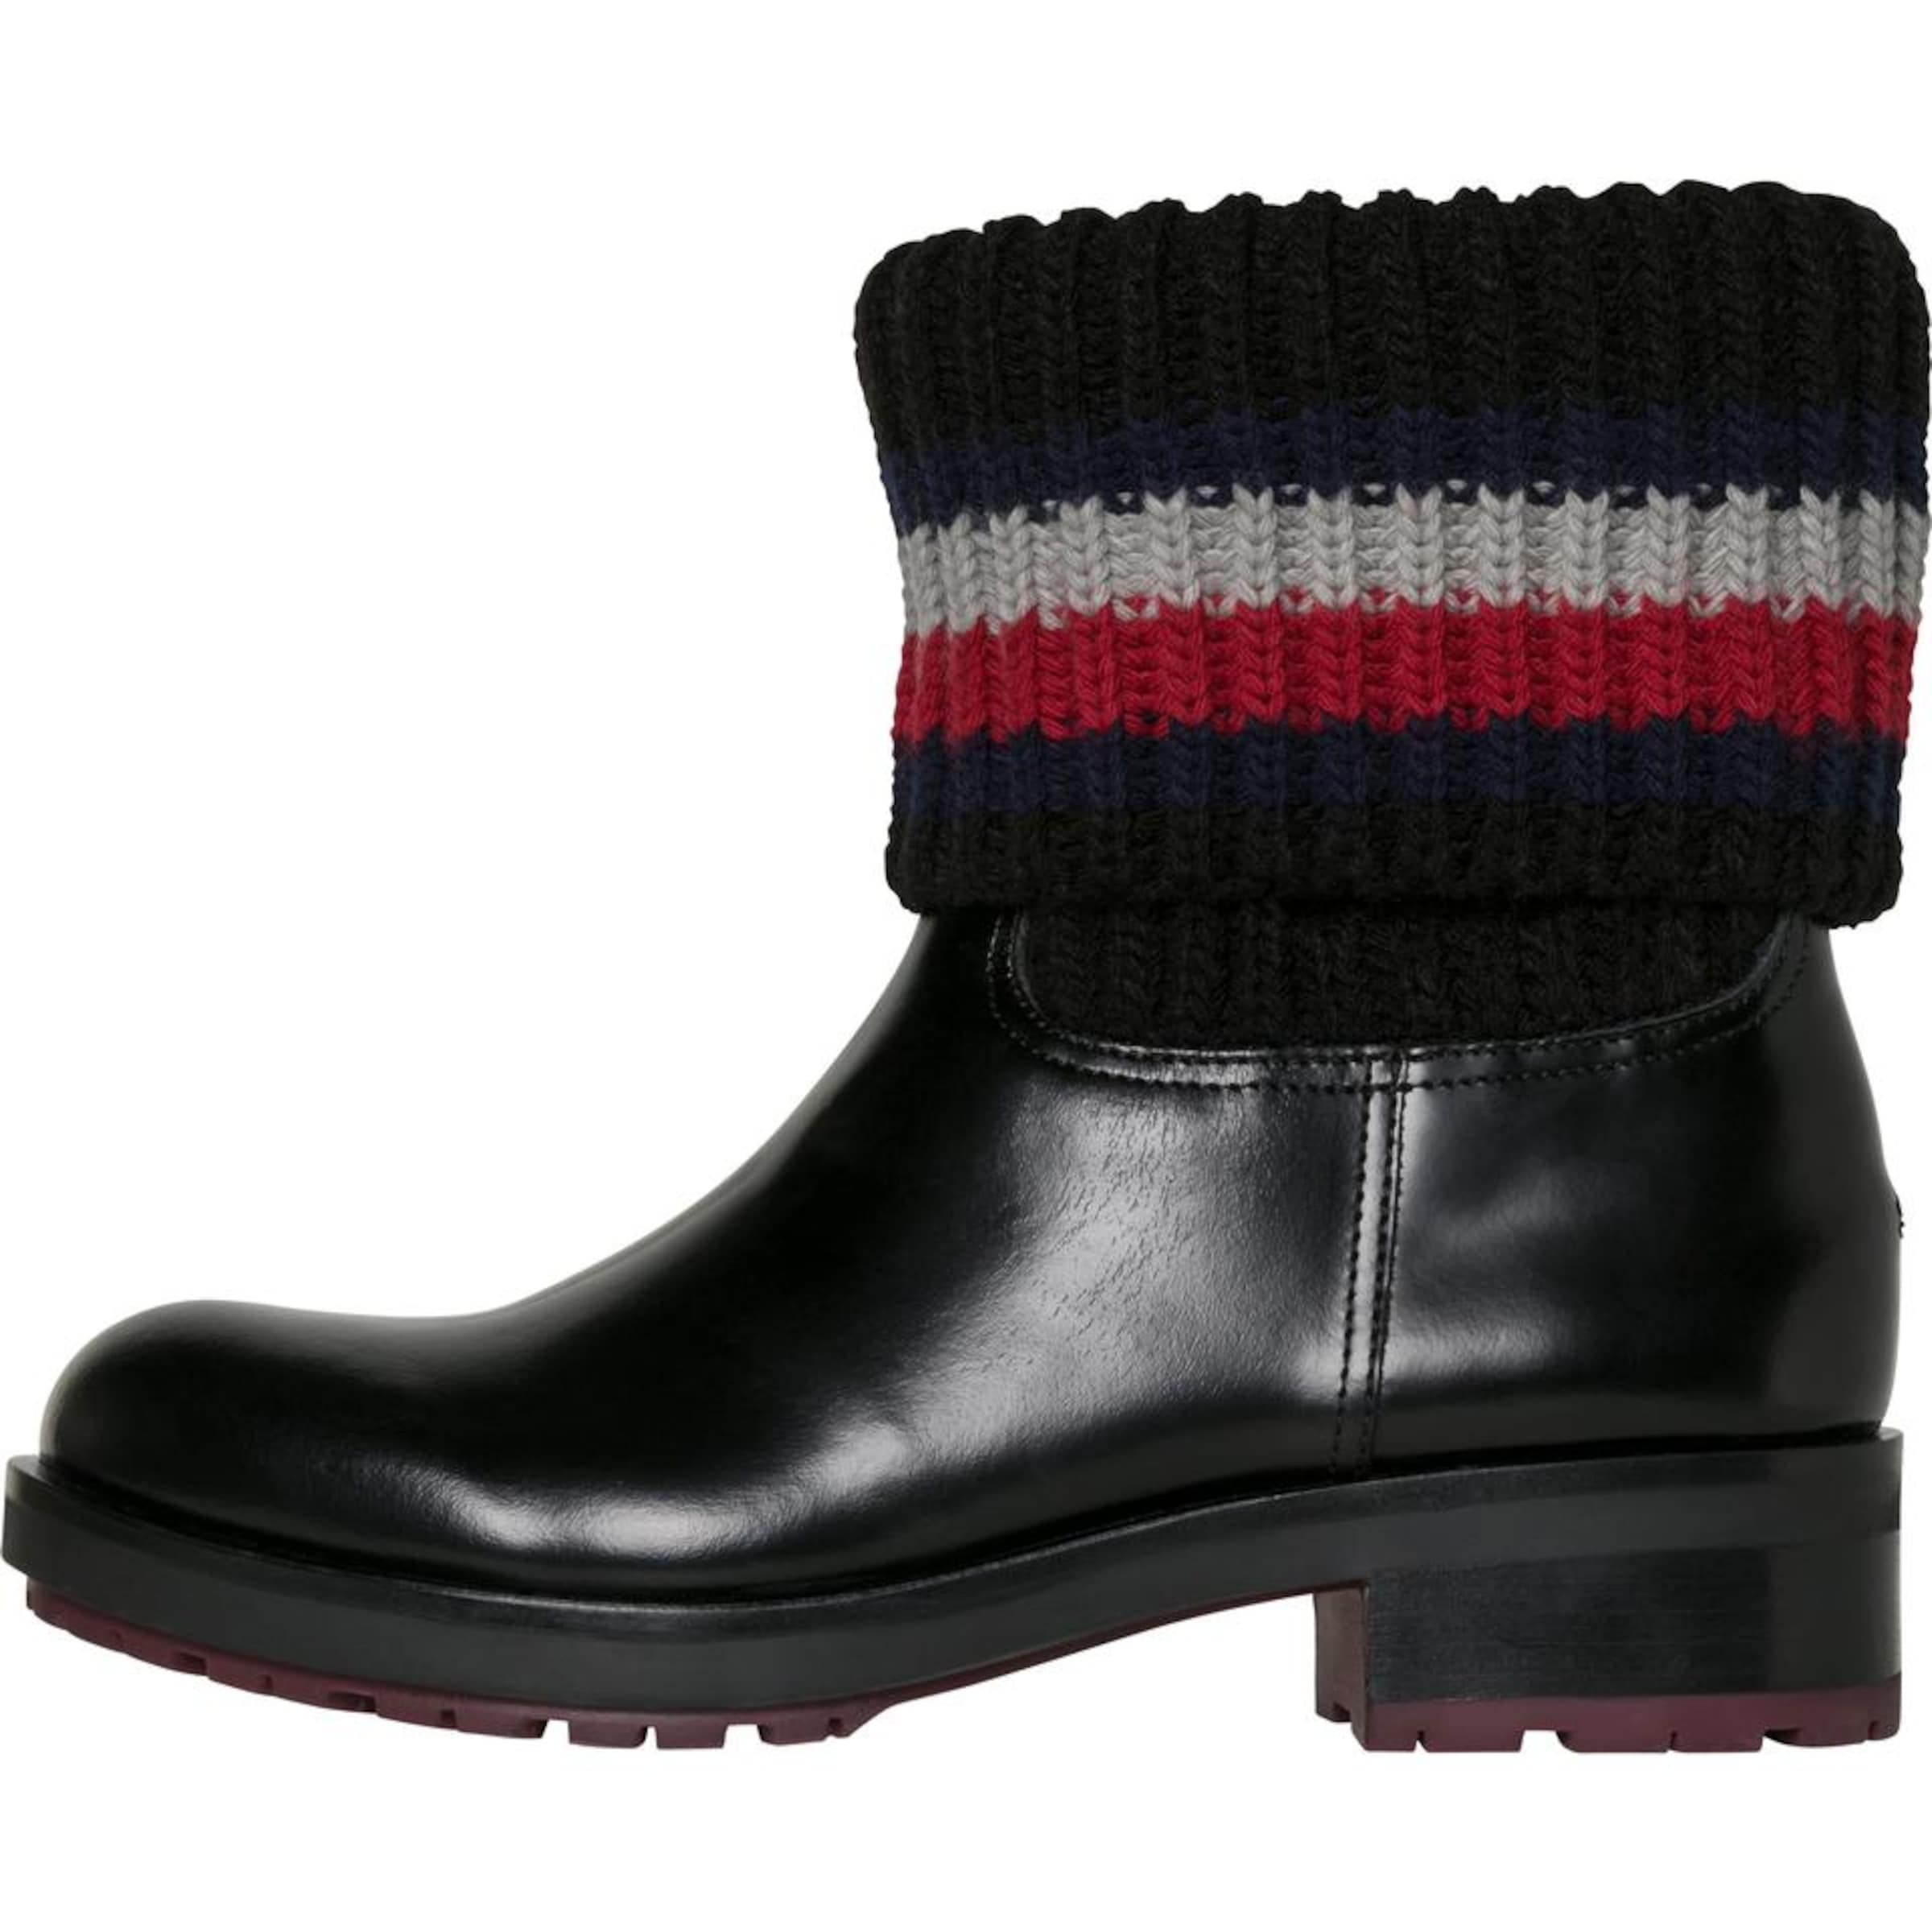 TOMMY HILFIGER HILFIGER HILFIGER | Boot 'J1285ILL 4C' Schuhe Gut getragene Schuhe bc783c